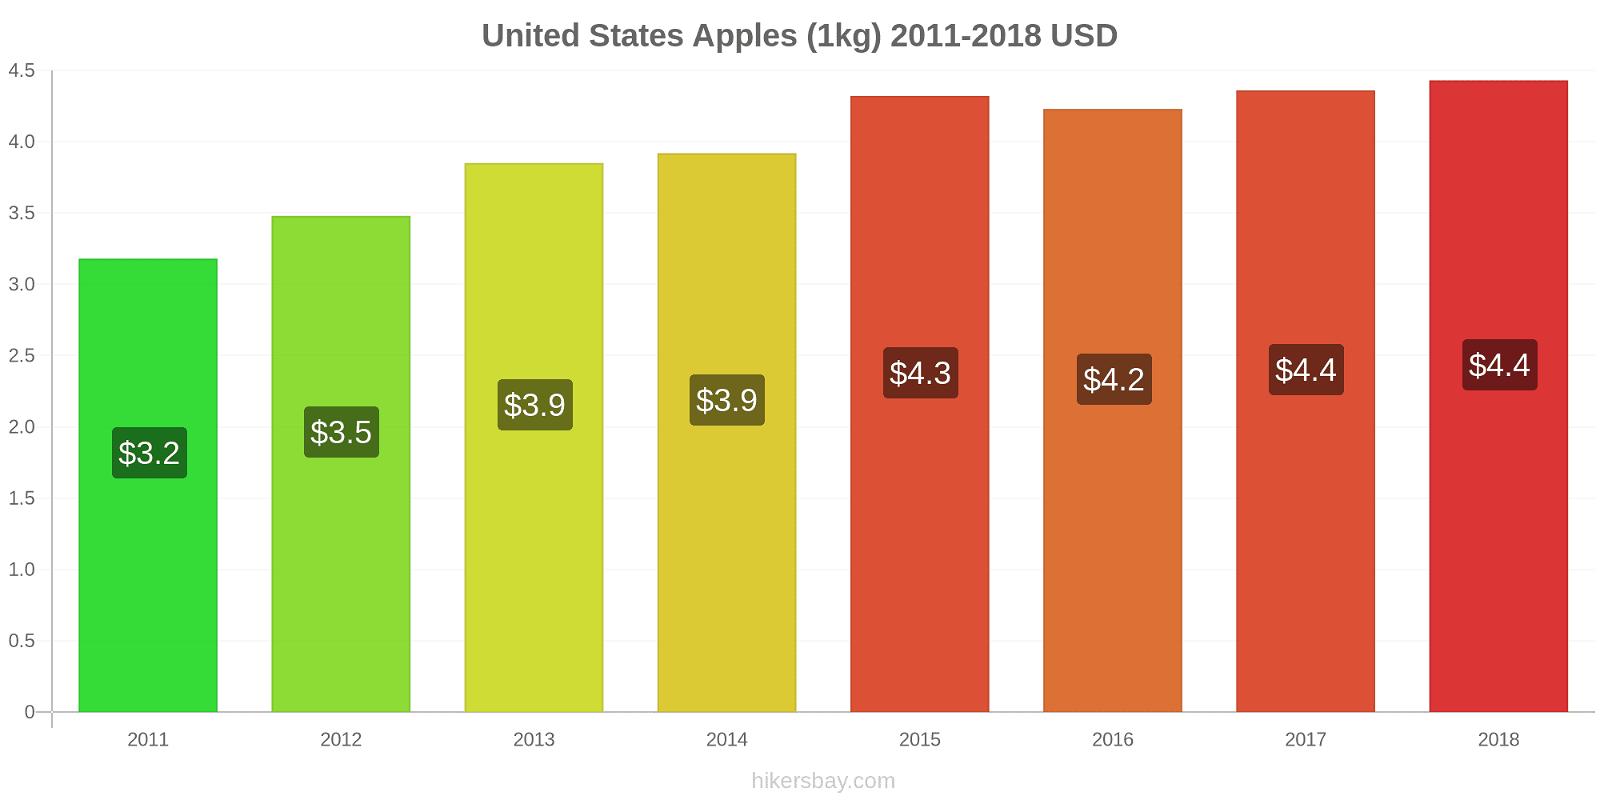 United States price changes Apples (1kg) hikersbay.com